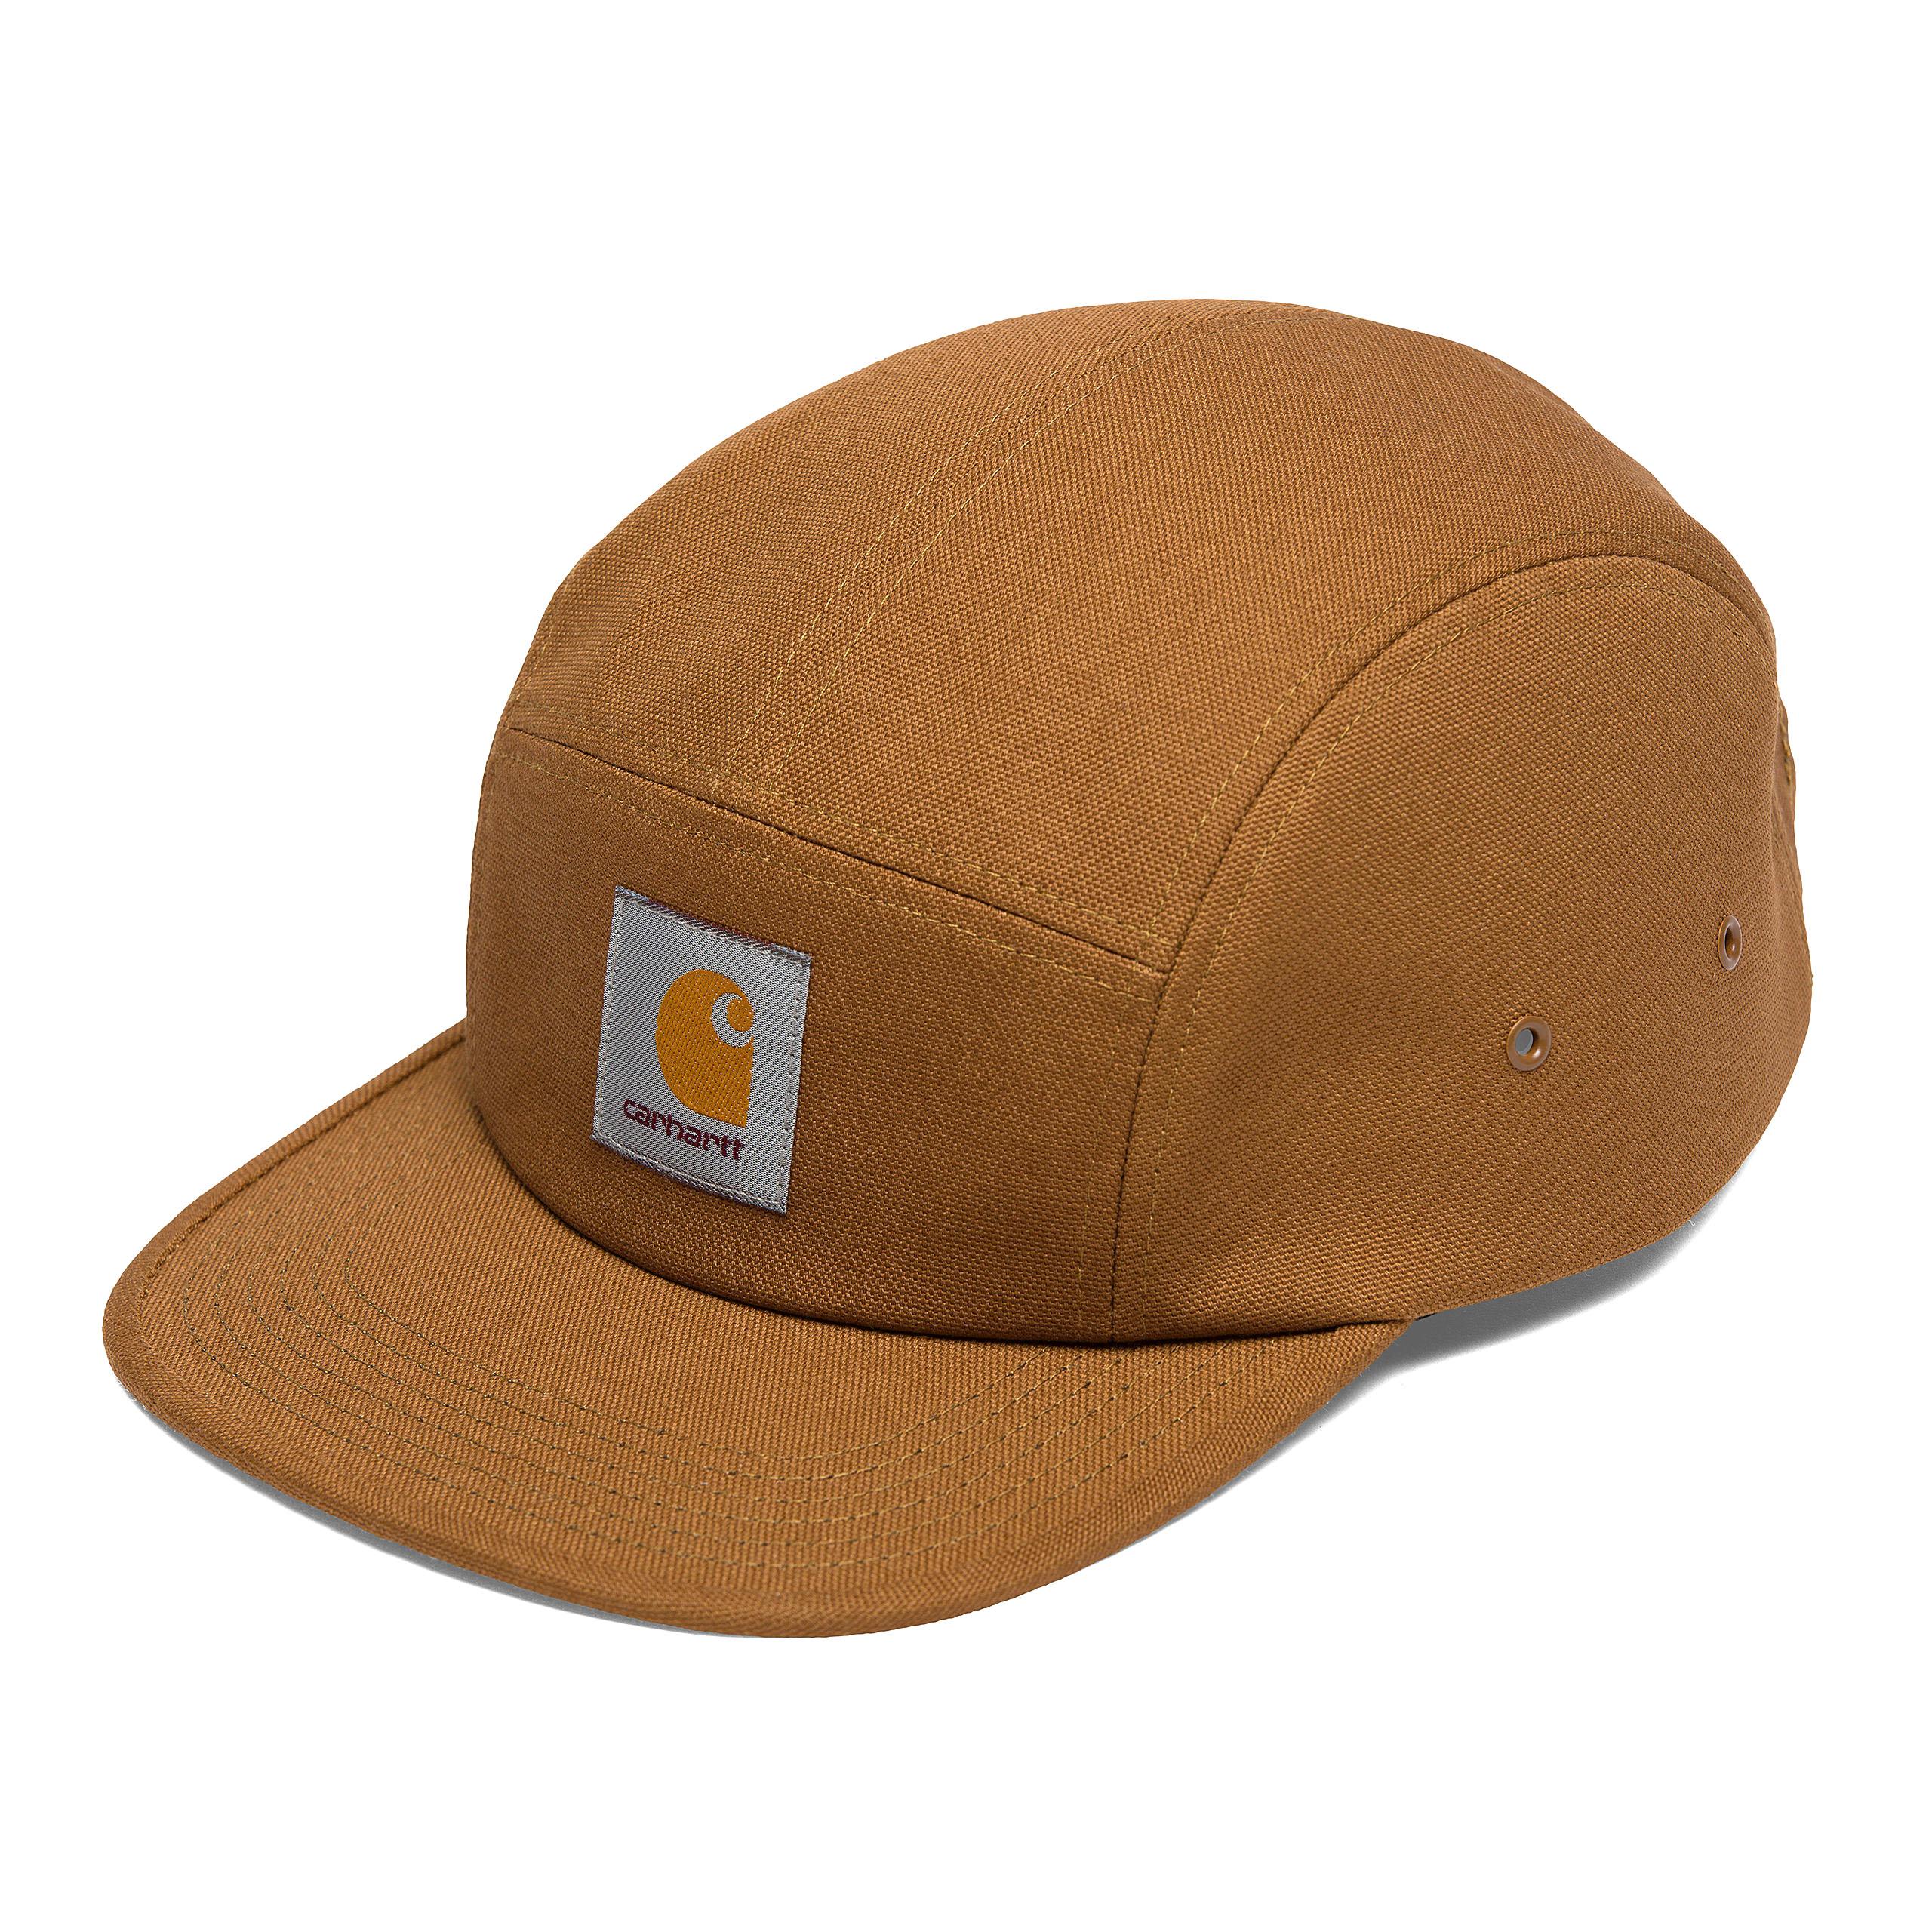 Carhartt WIP - BACKLEY CAP - Hamilton Brown